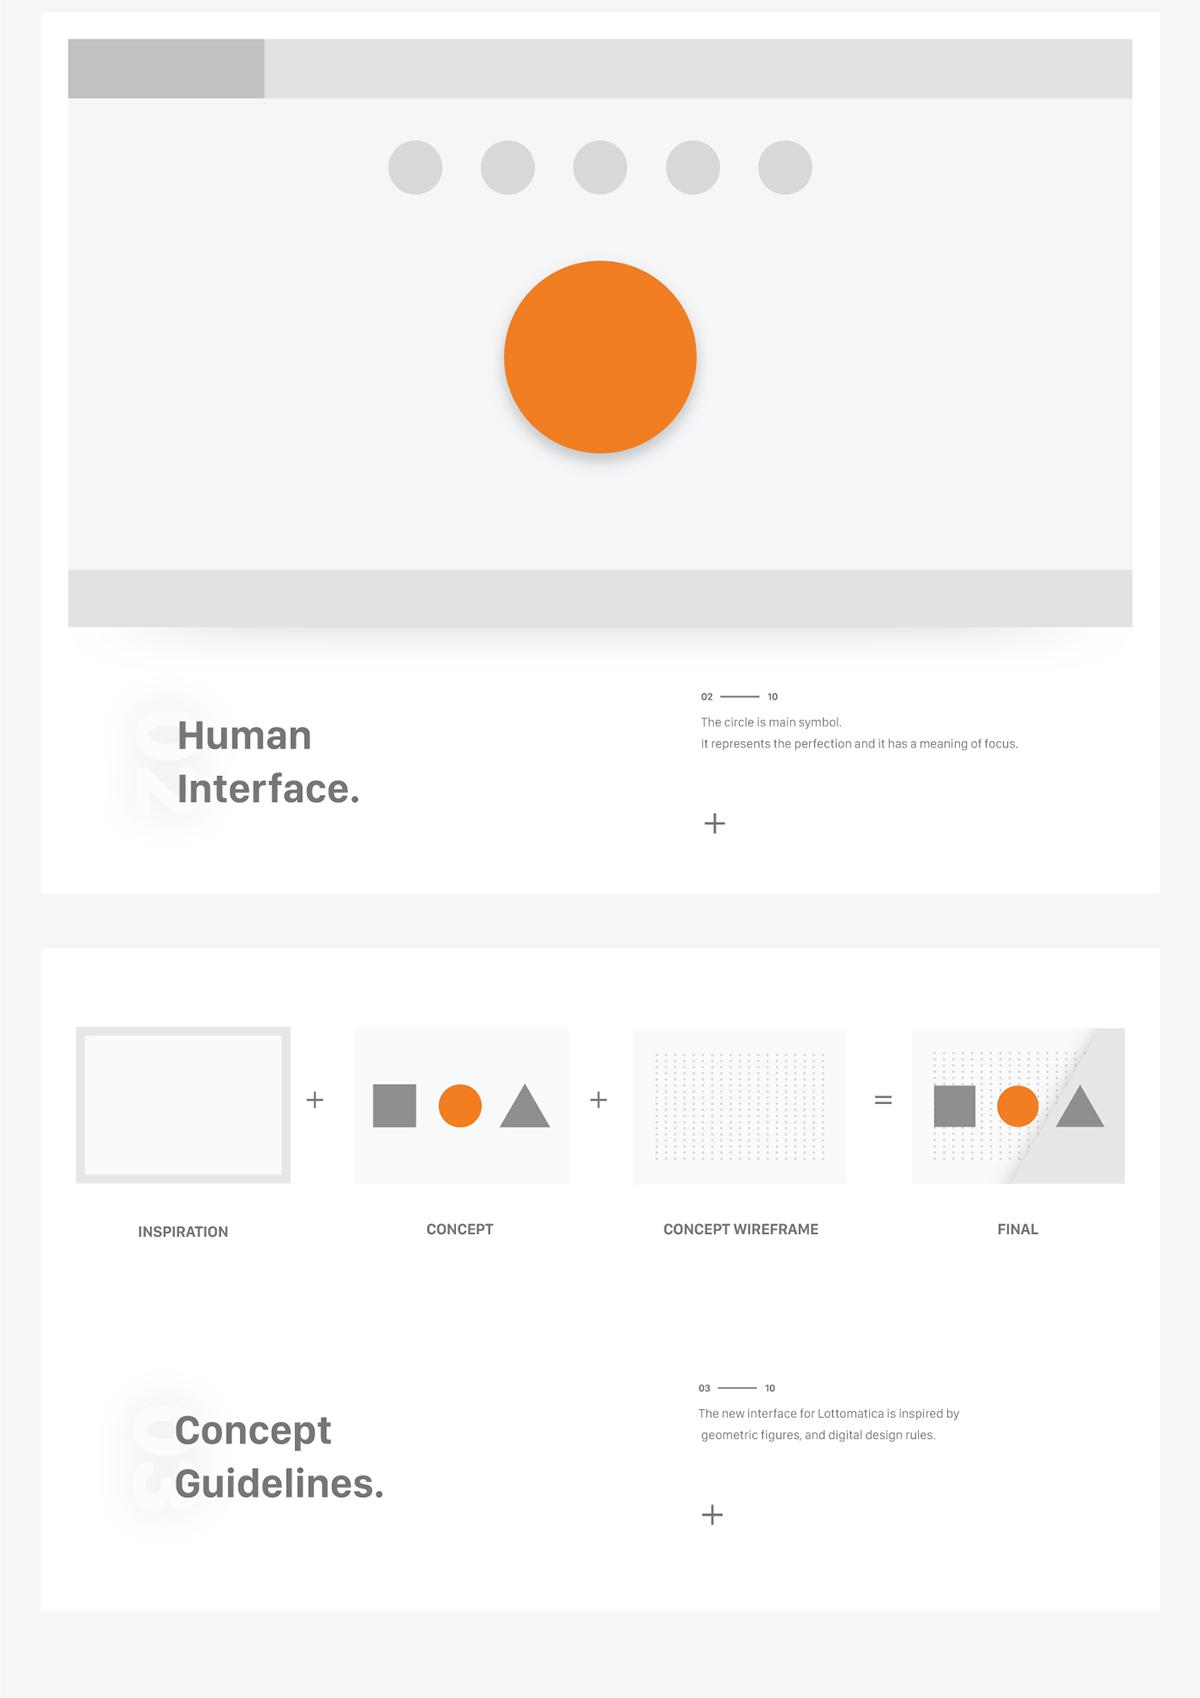 Design language lotto ui material design on wacom gallery for Design language milano